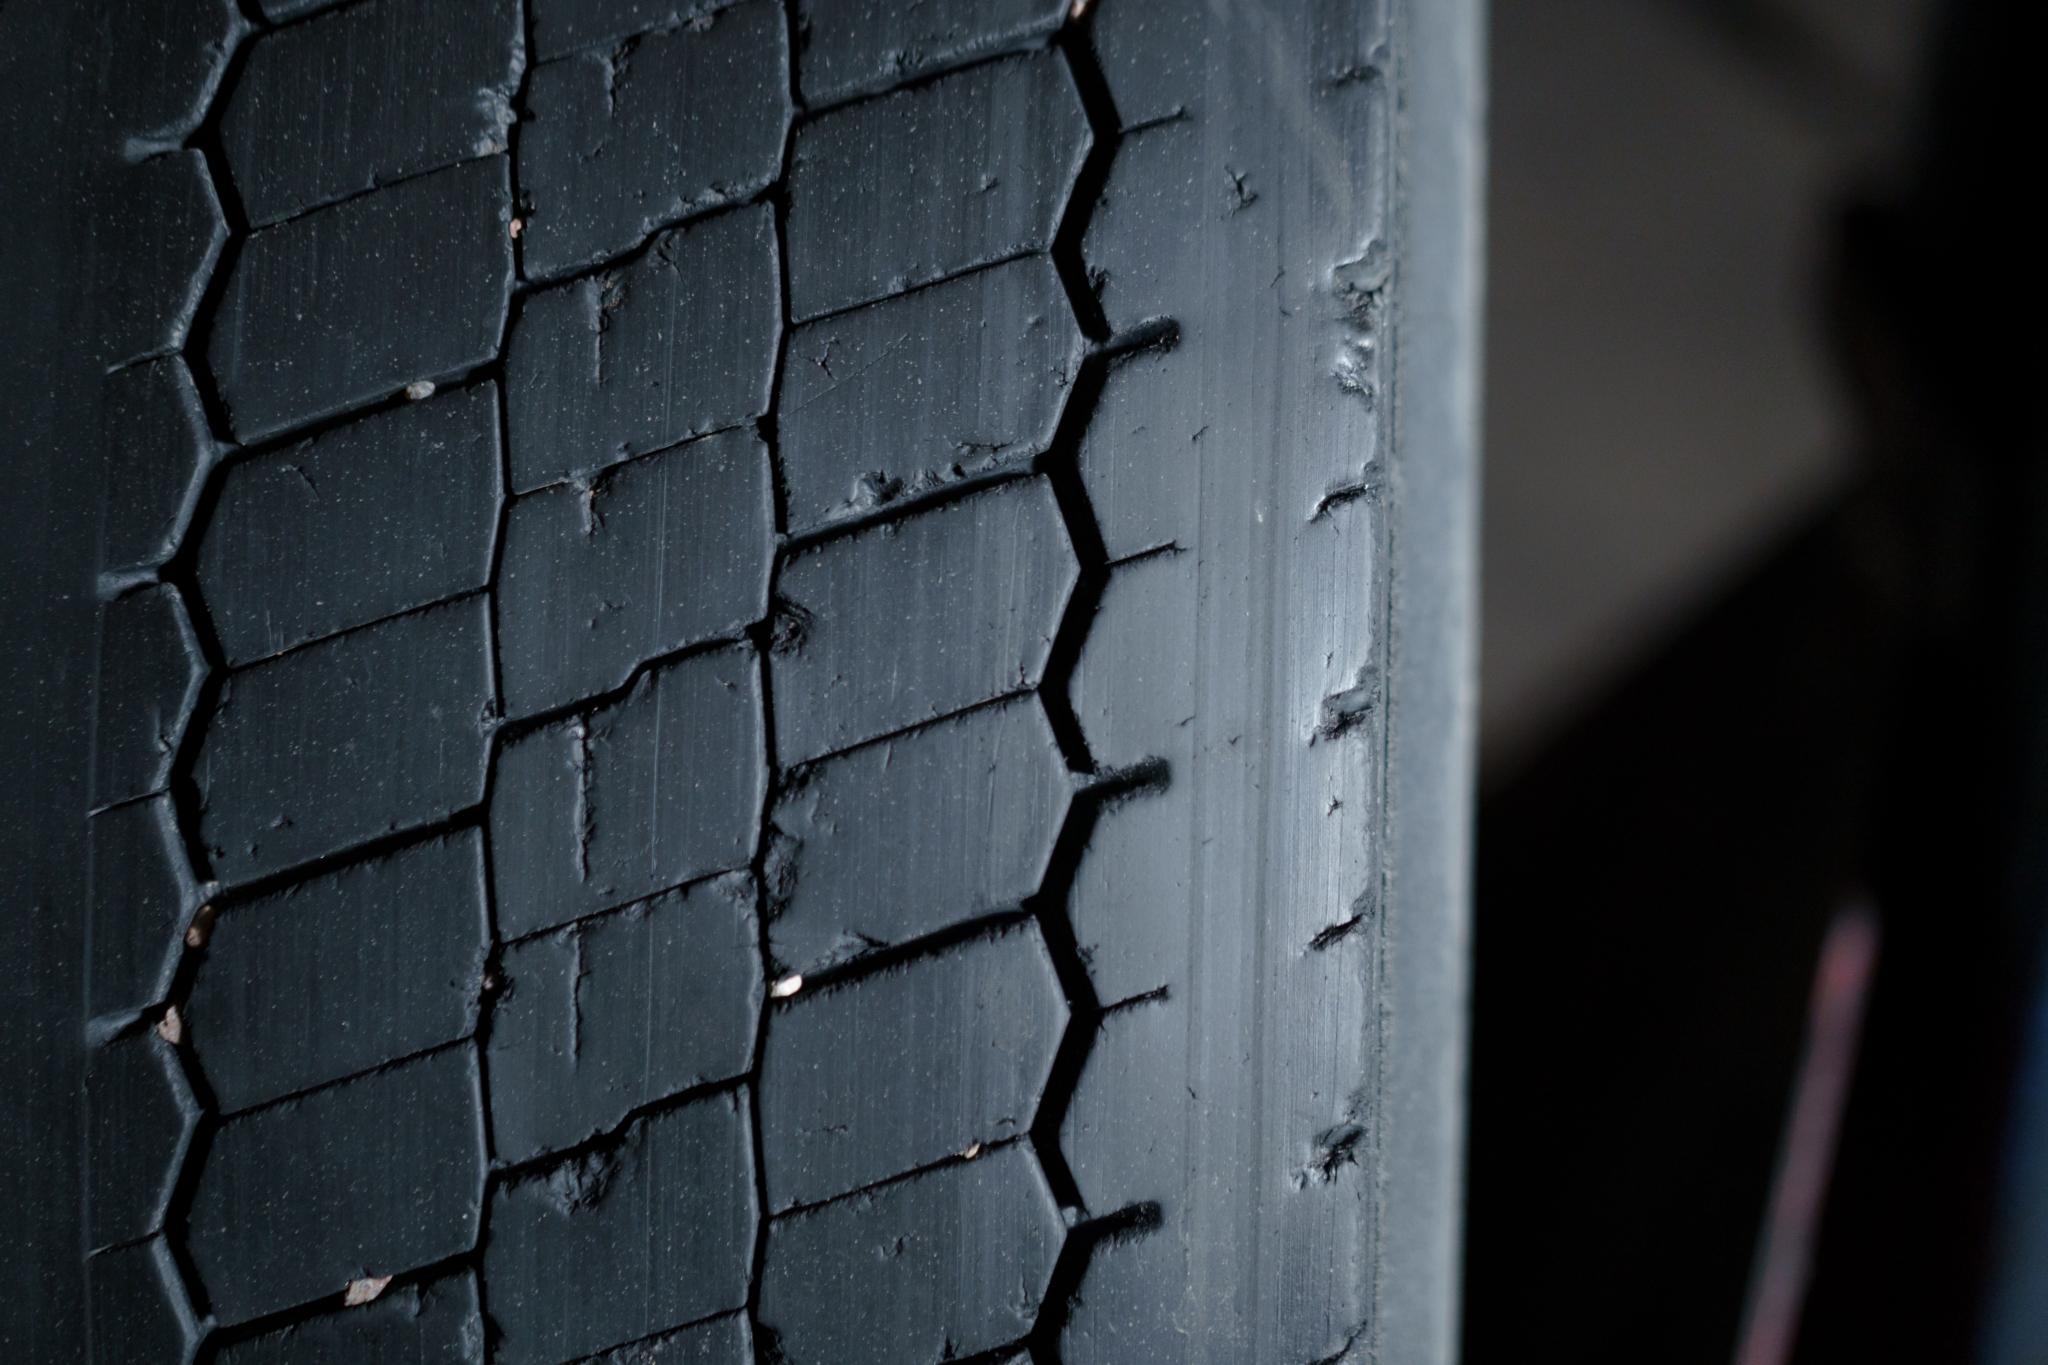 Global retreaded tyre sales to hit $8.8 billion in 2021